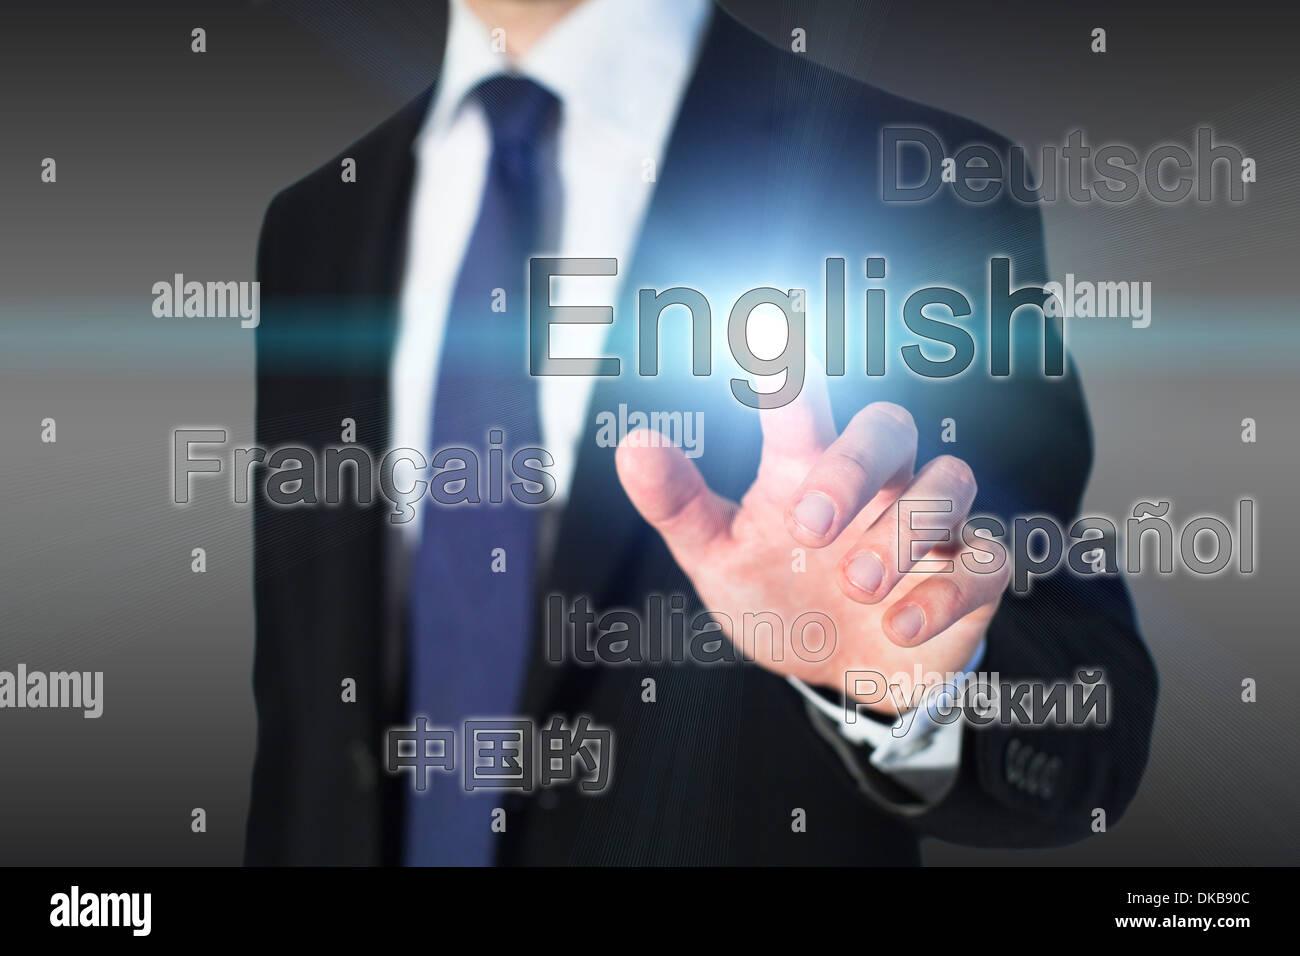 learning english, language school concept - Stock Image